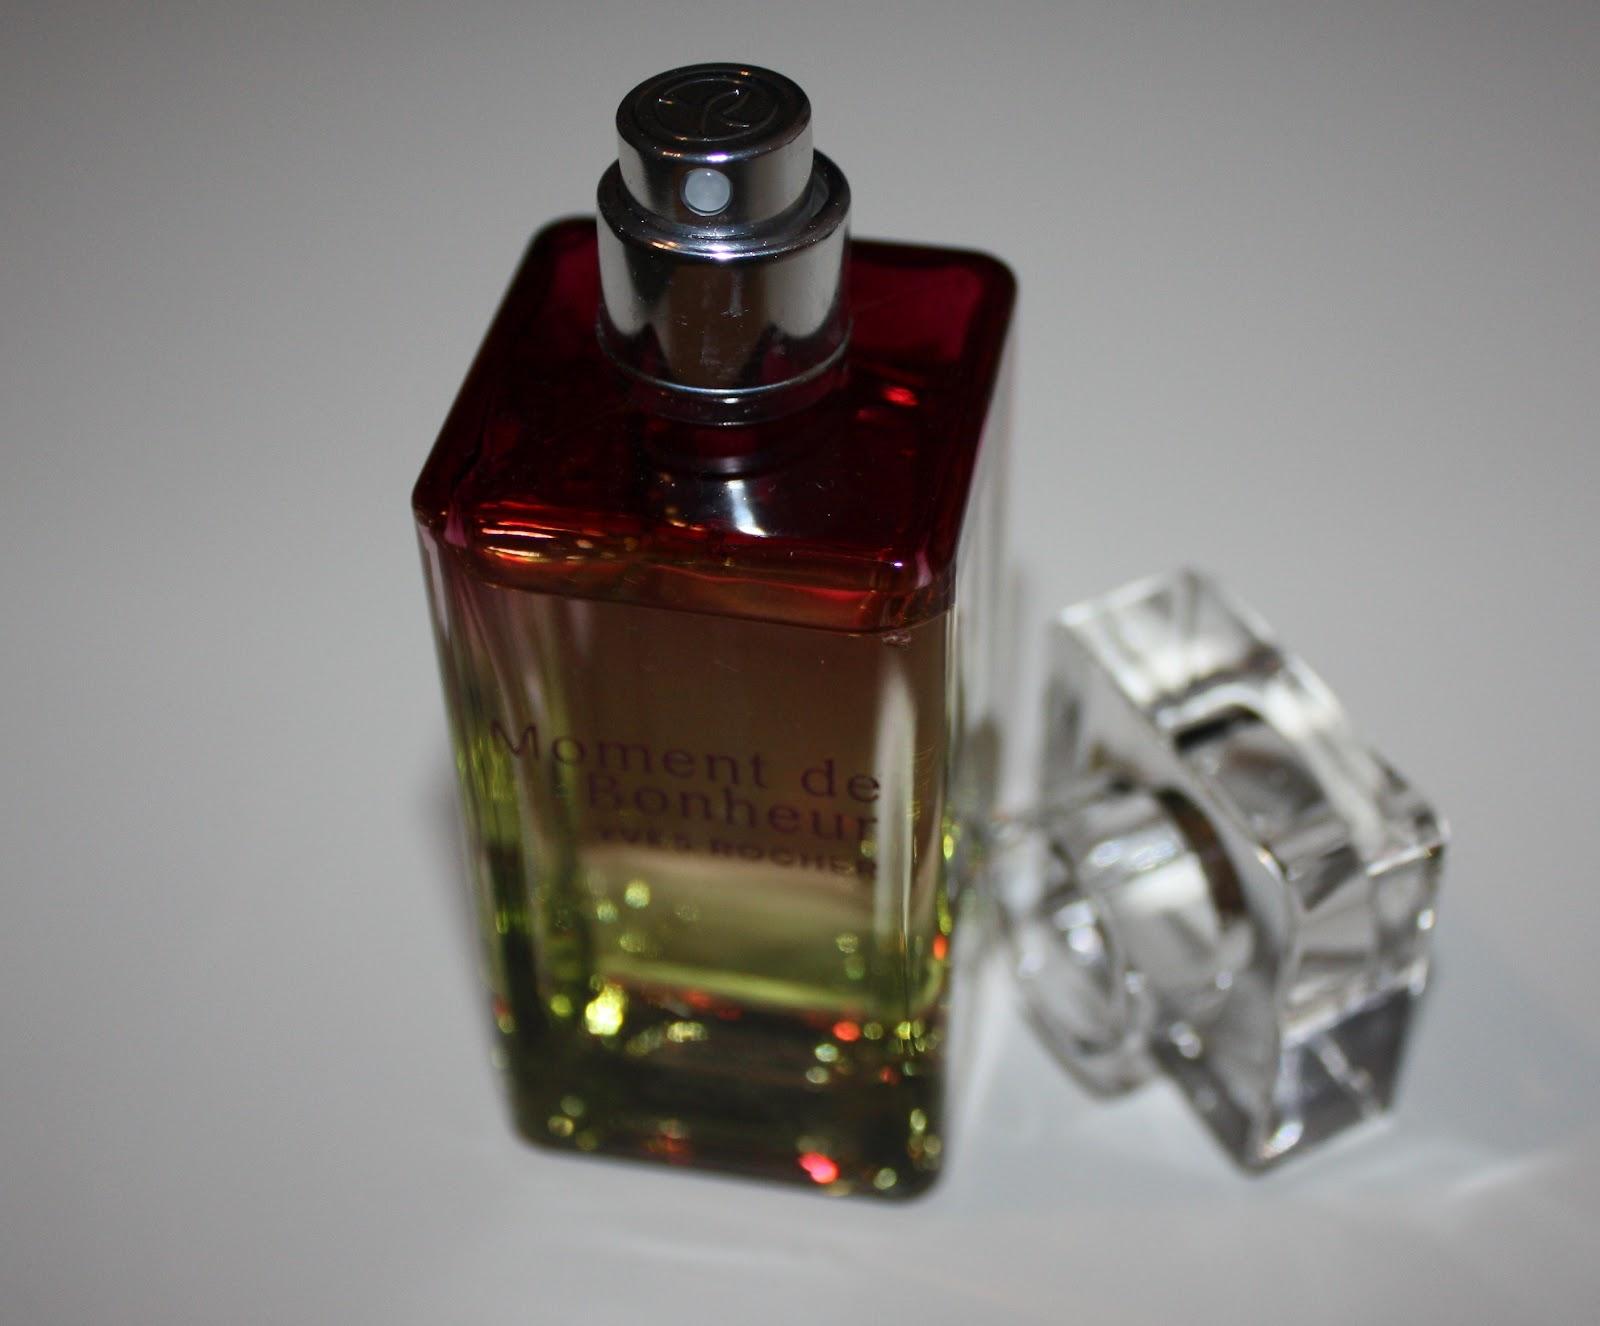 rinolanas beauty blog chlo parfum dupe. Black Bedroom Furniture Sets. Home Design Ideas